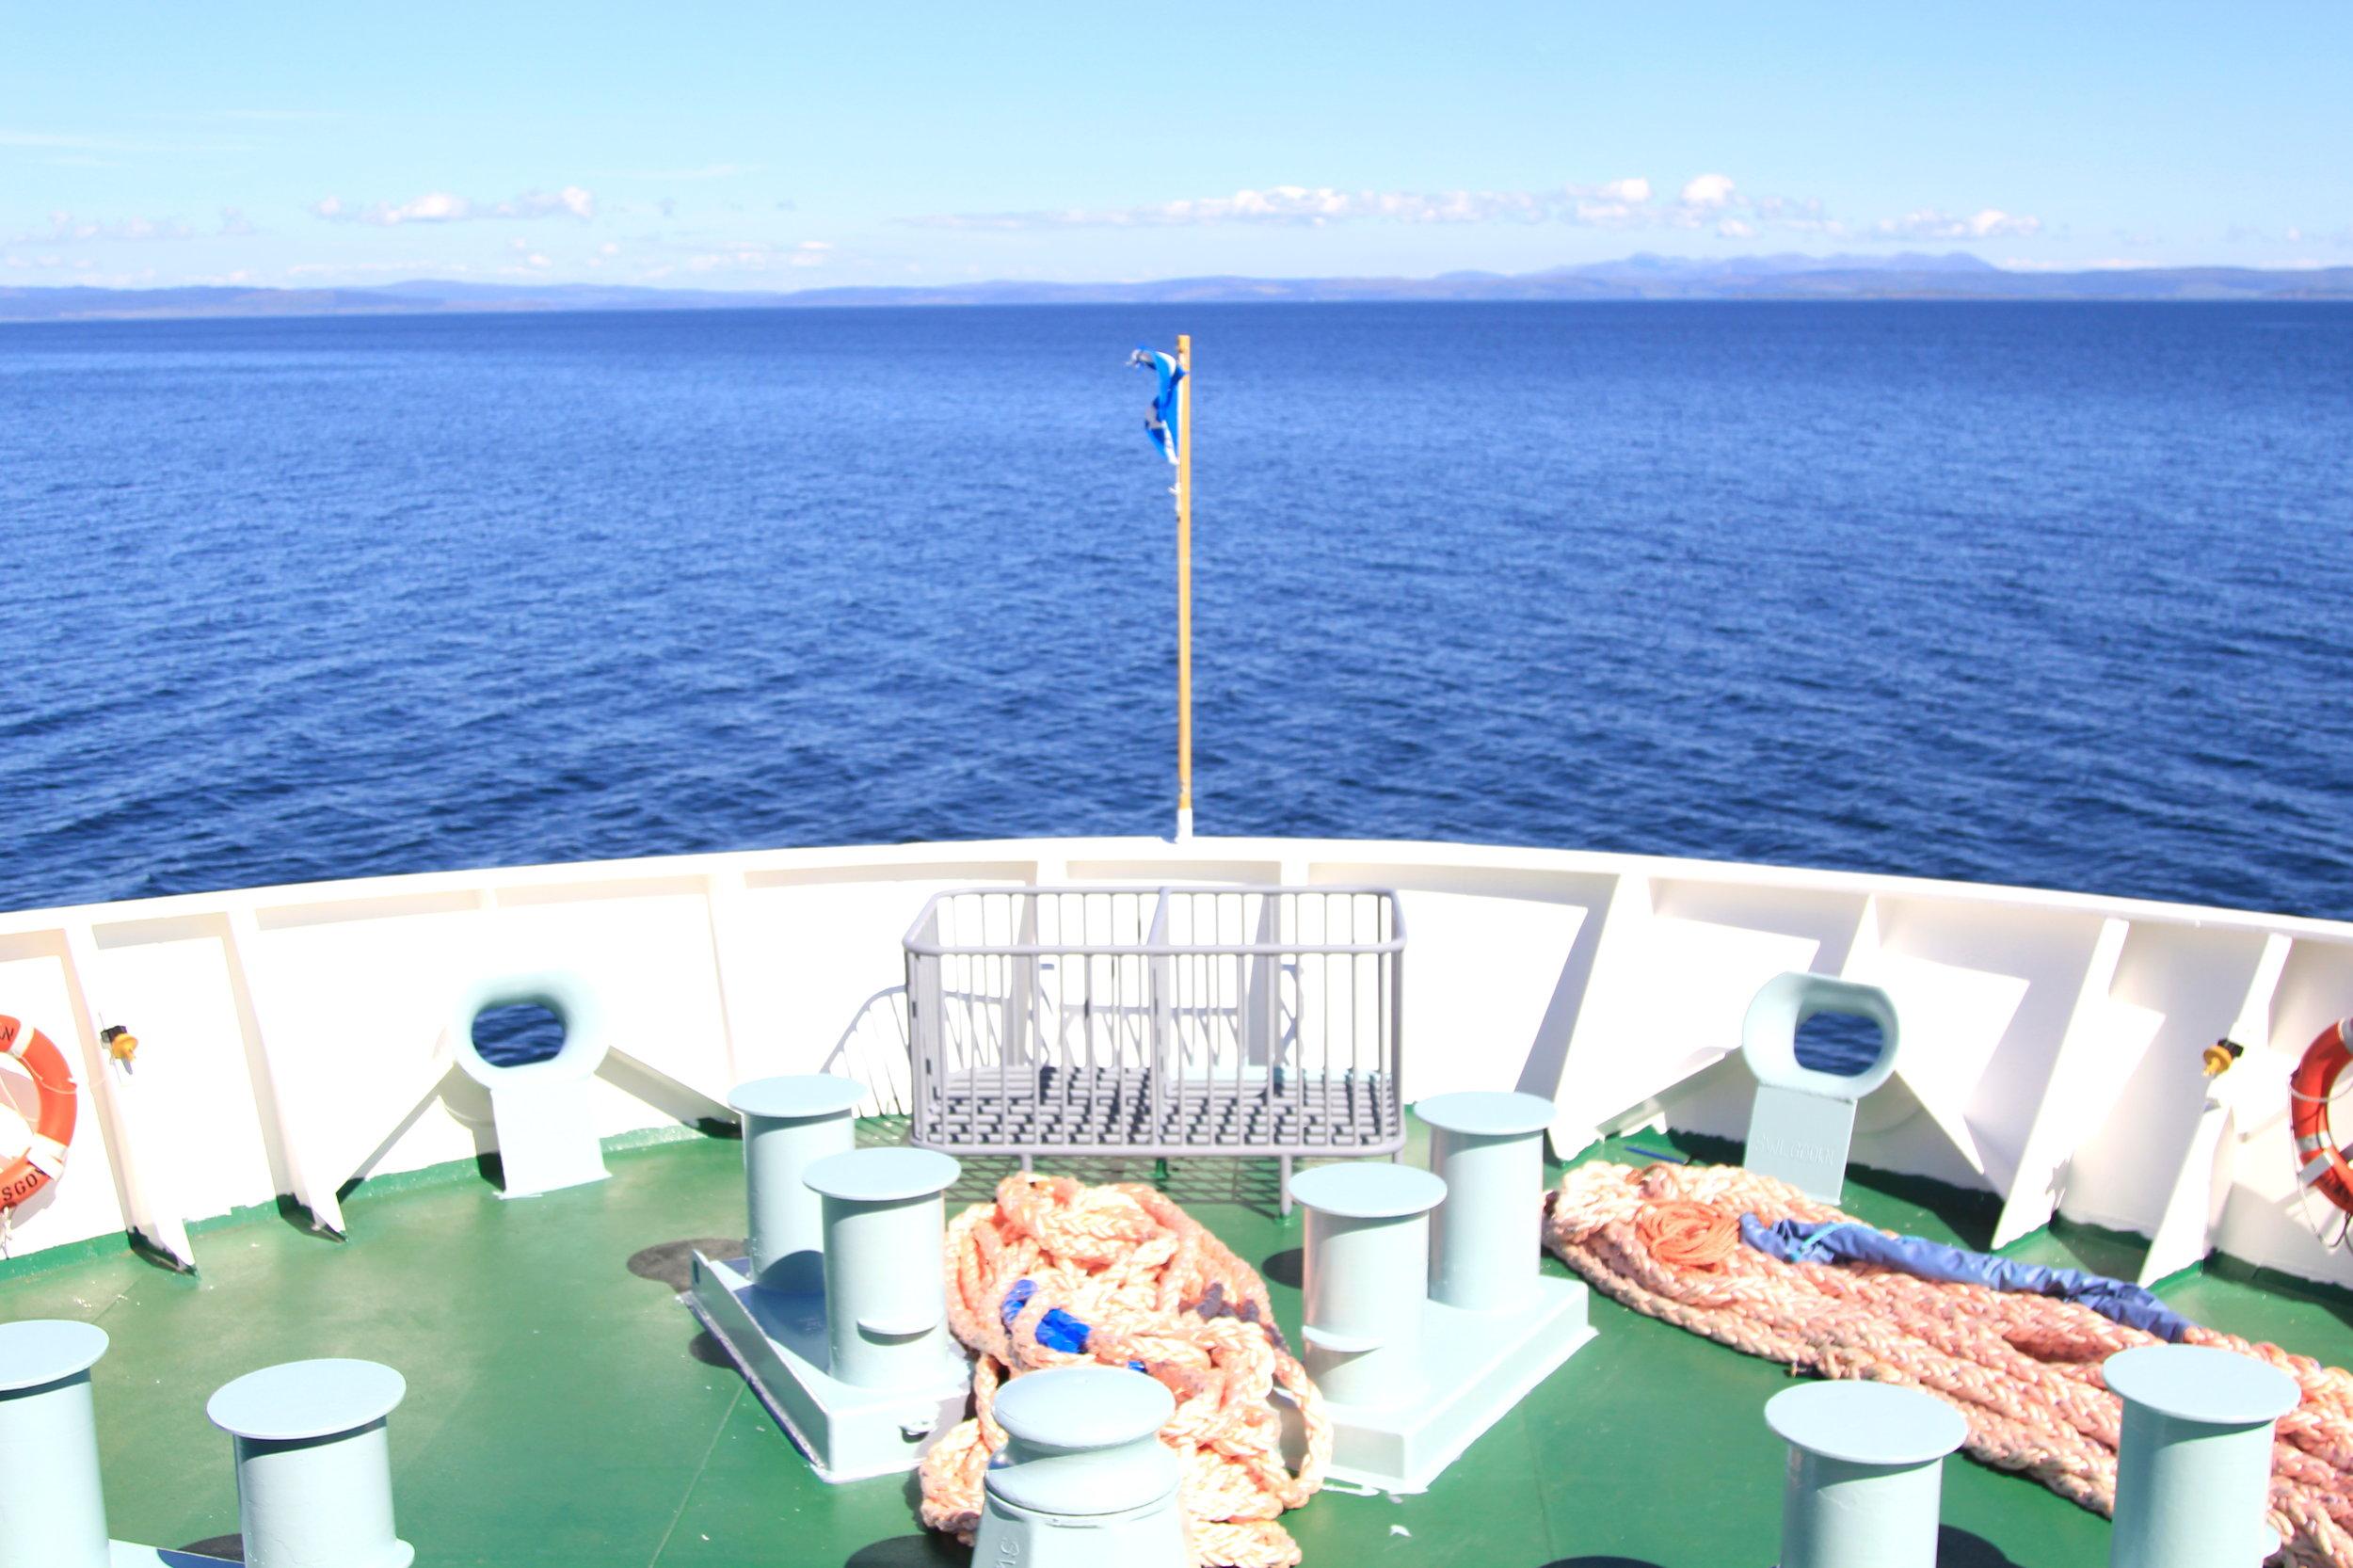 Ferry to Islay, Scotland